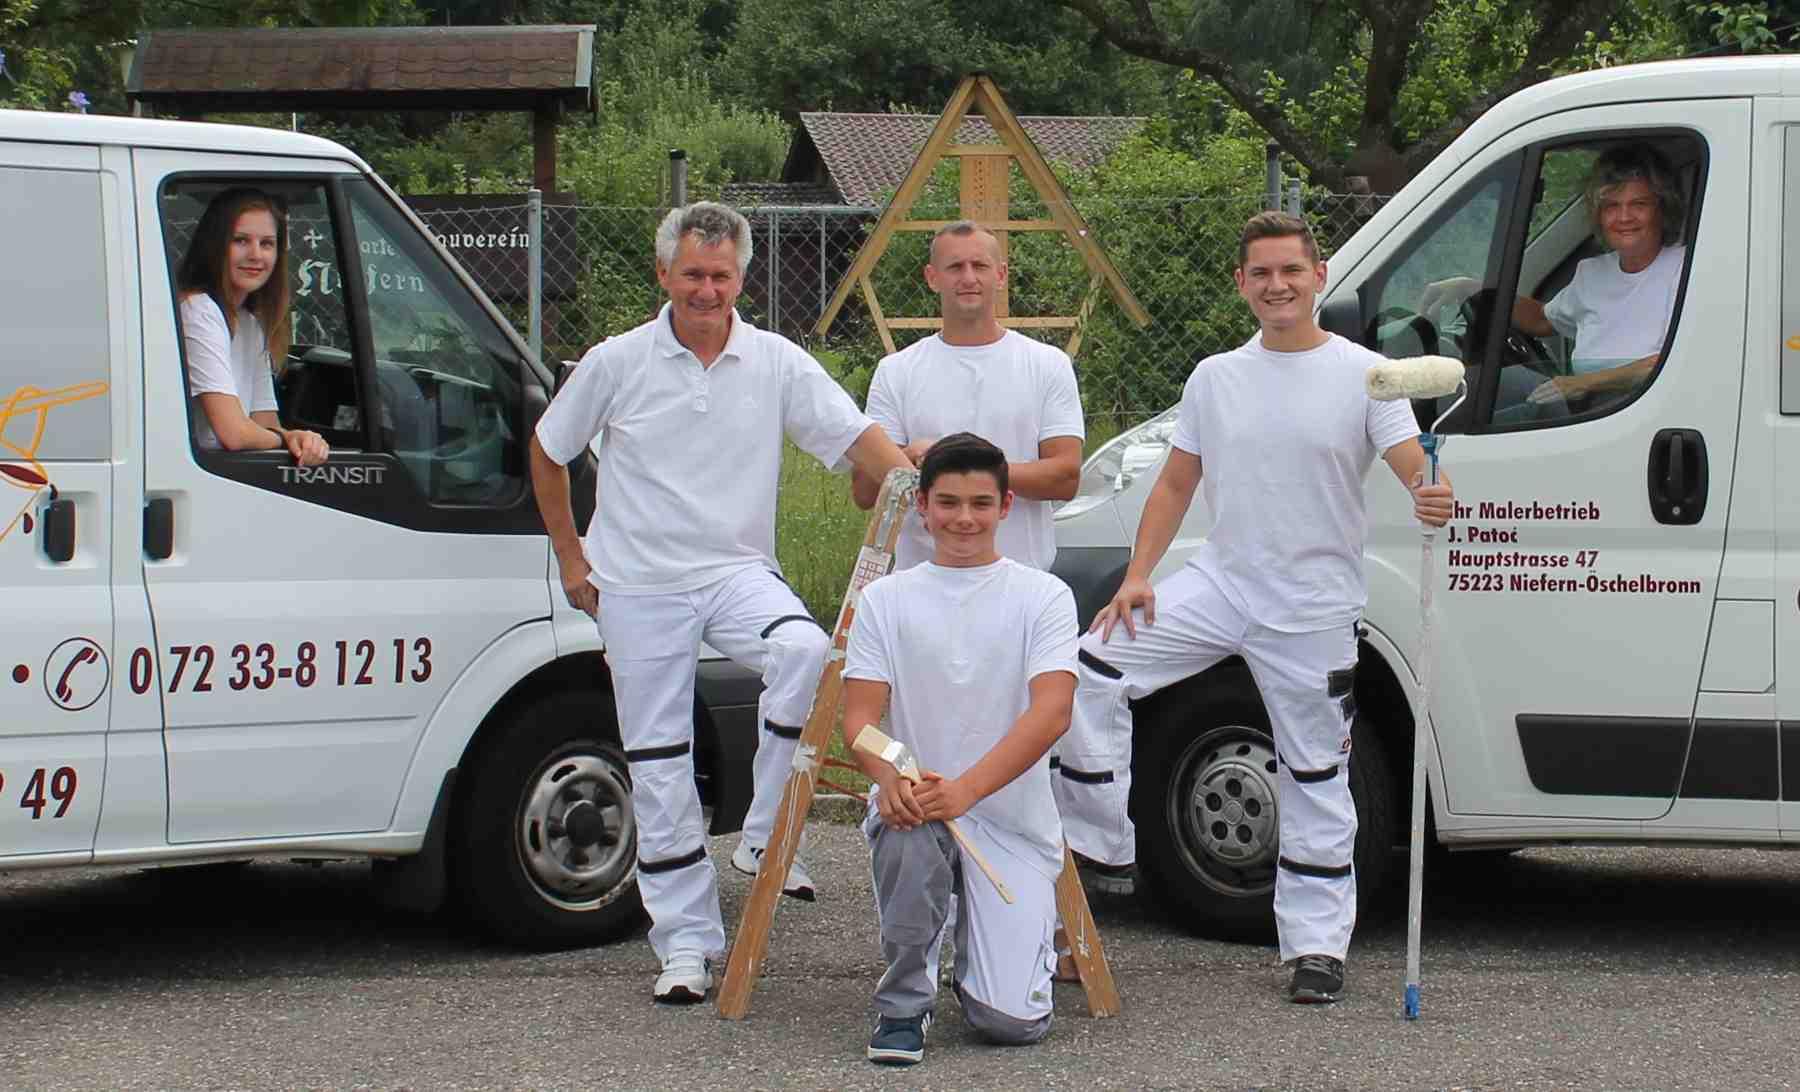 Malerbetrieb-Josef-Patoc-Niefern-Oeschelbronn-Placeholder-Team-